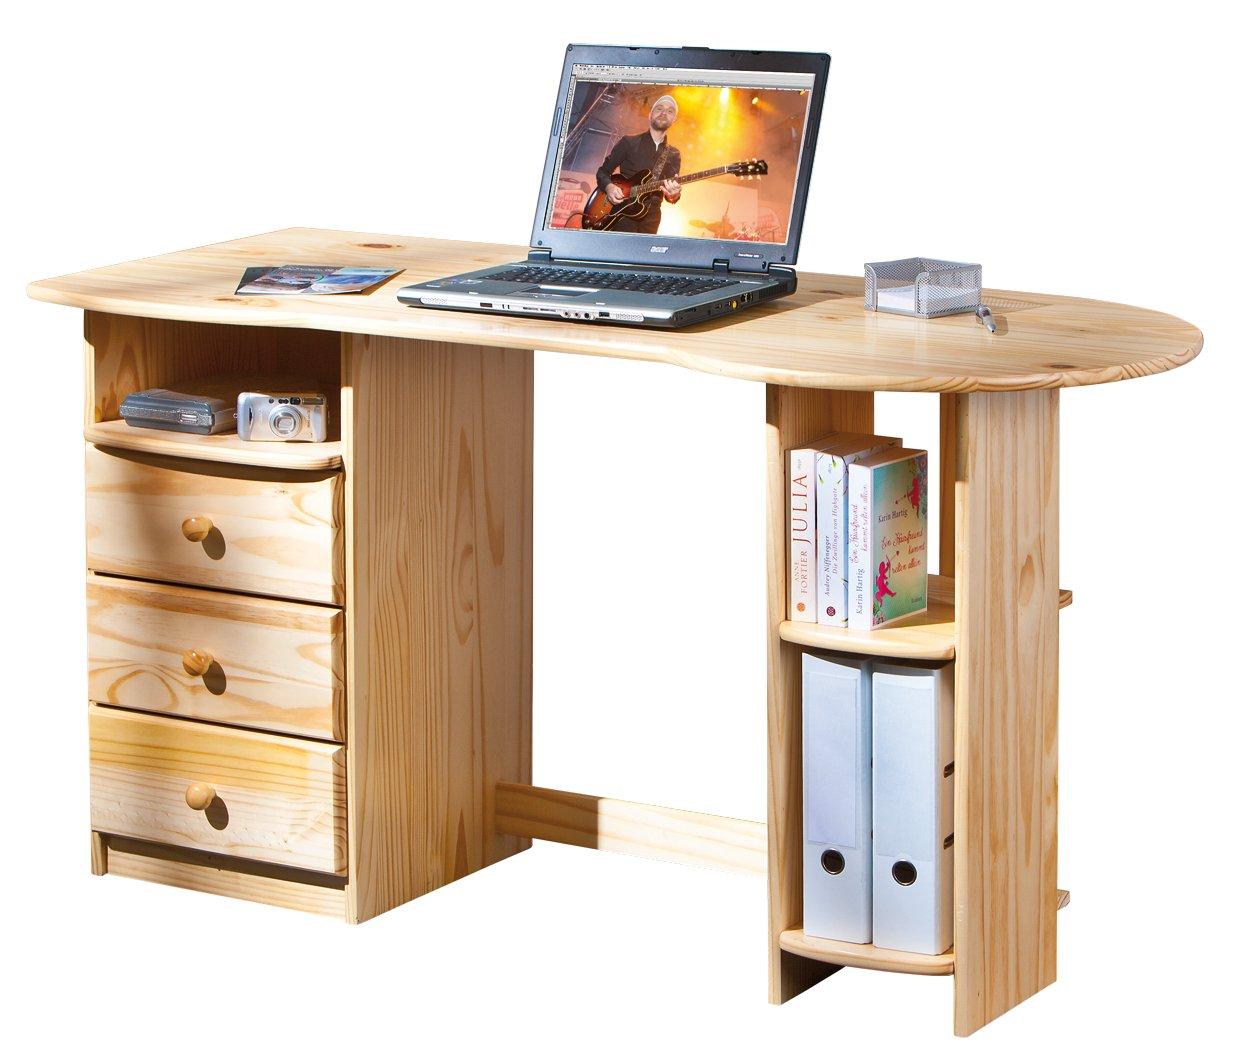 Links - Office A13 - Porta pc. Dim: 137x61x76 h cm. Col: Naturale. Mat: Legno massello. 30600570 F00011901034